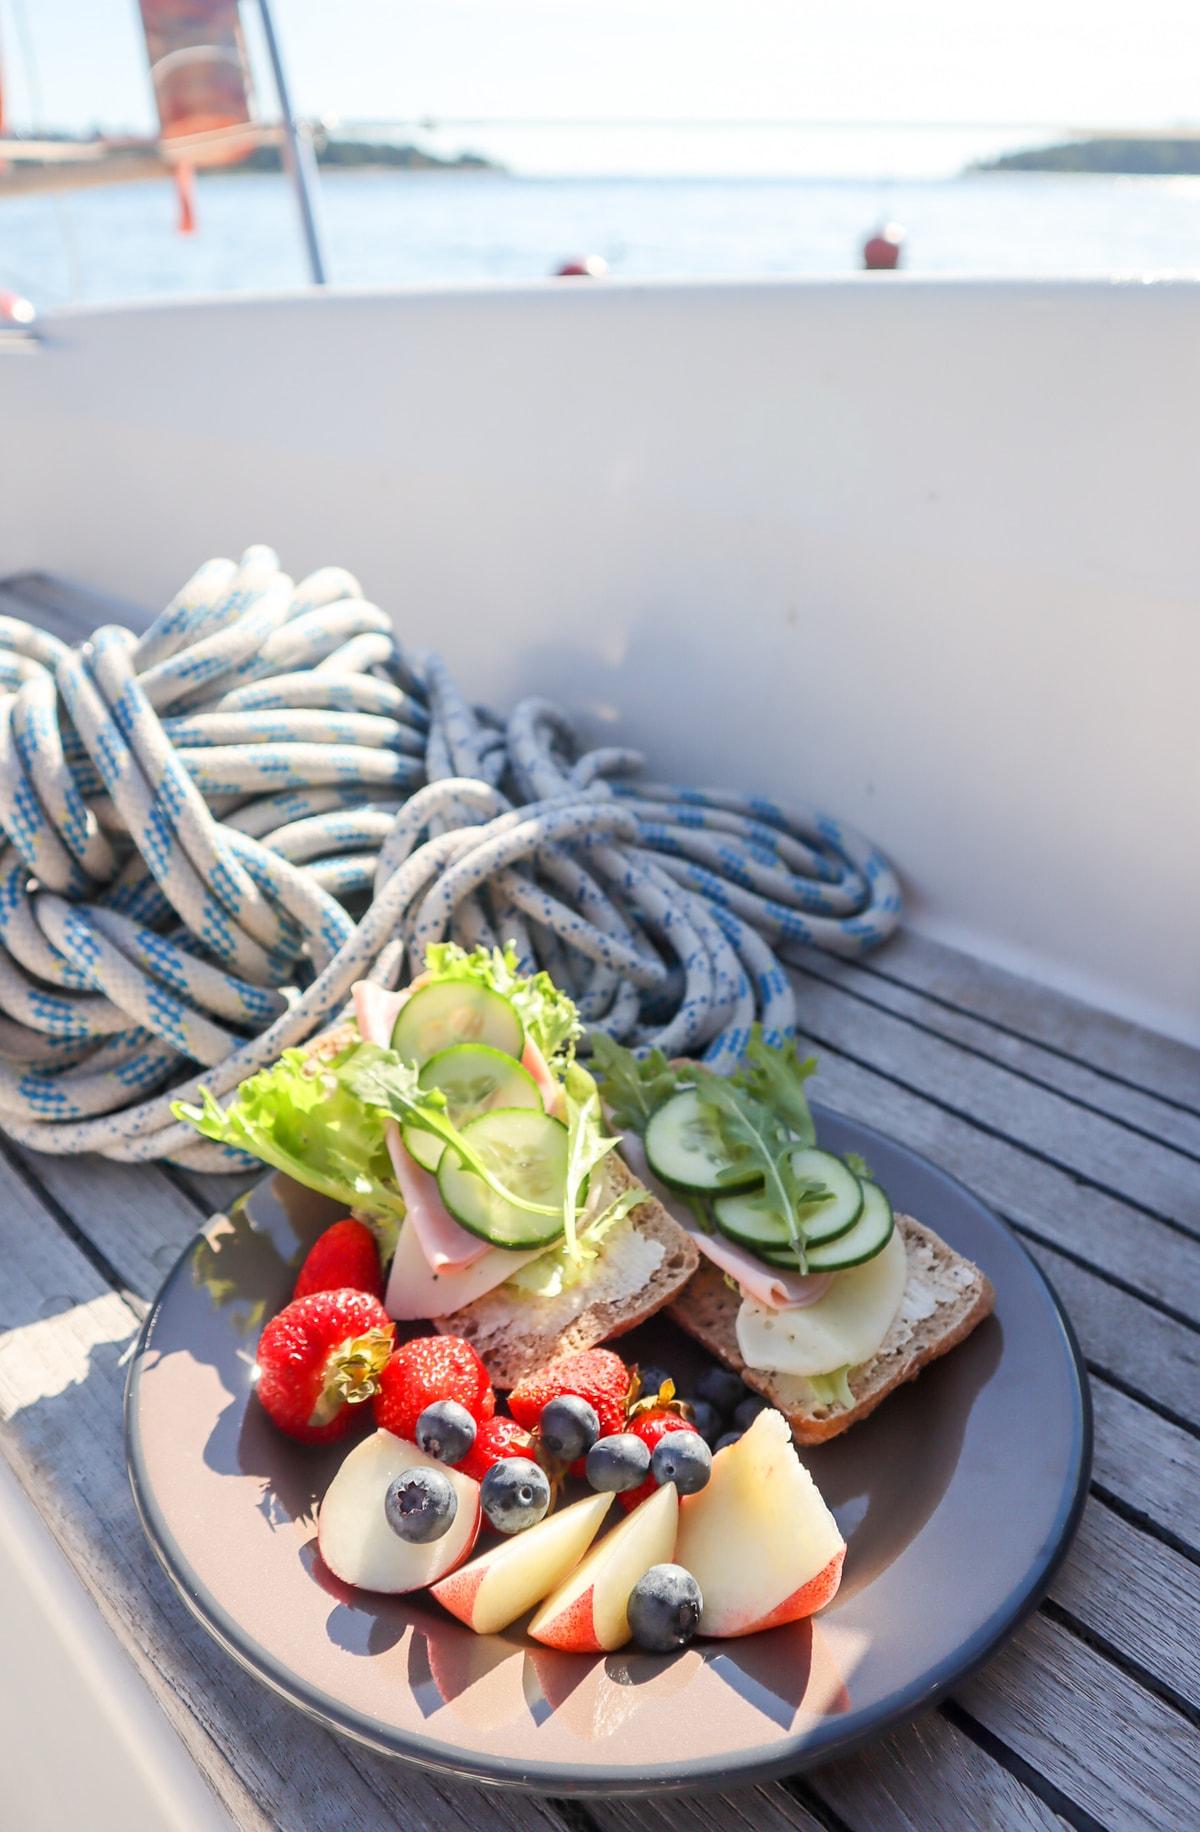 Aamupala veneen kannella